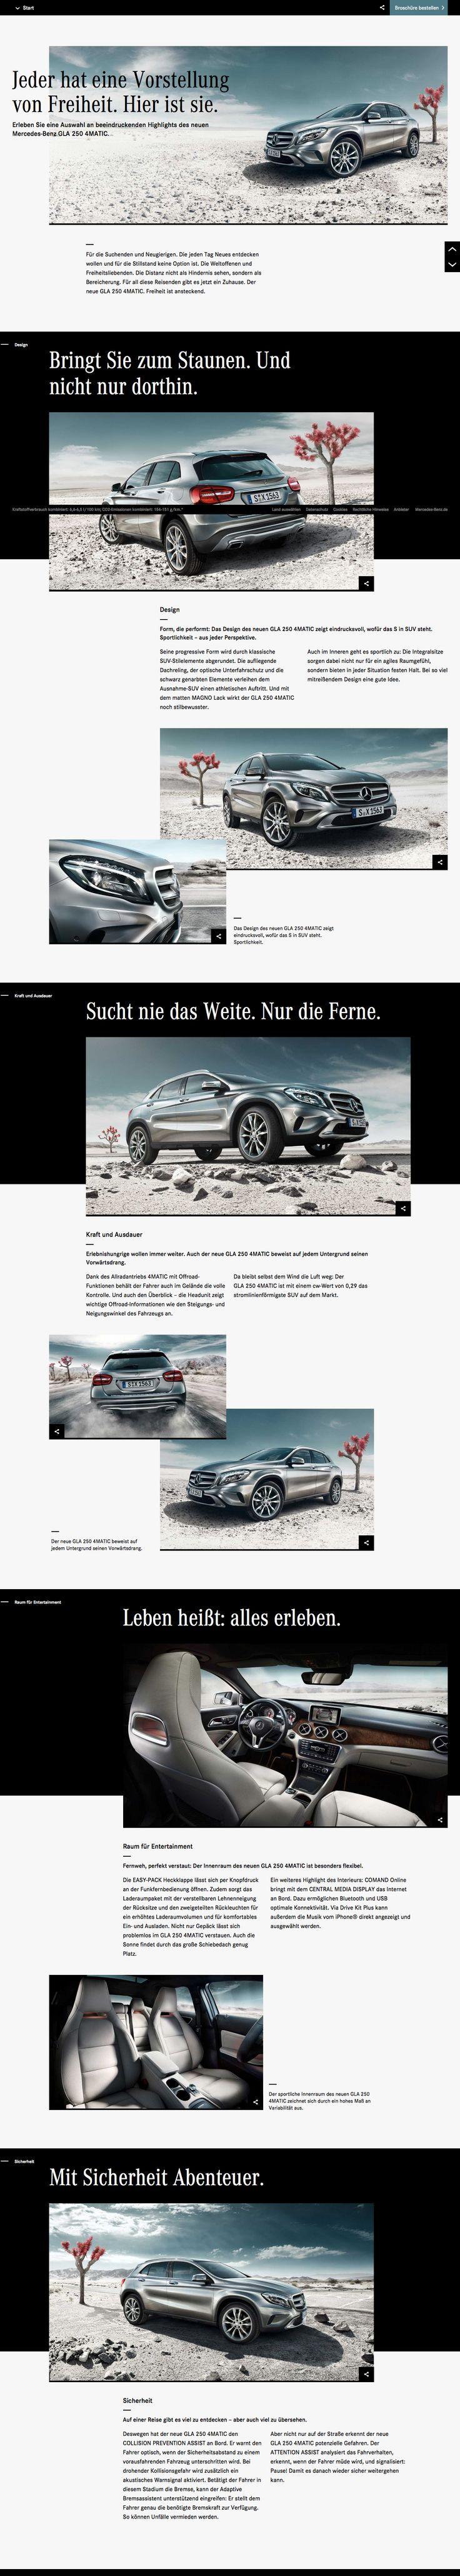 Mercedes-Benz International: News, Pictures, Videos & Livestreams.